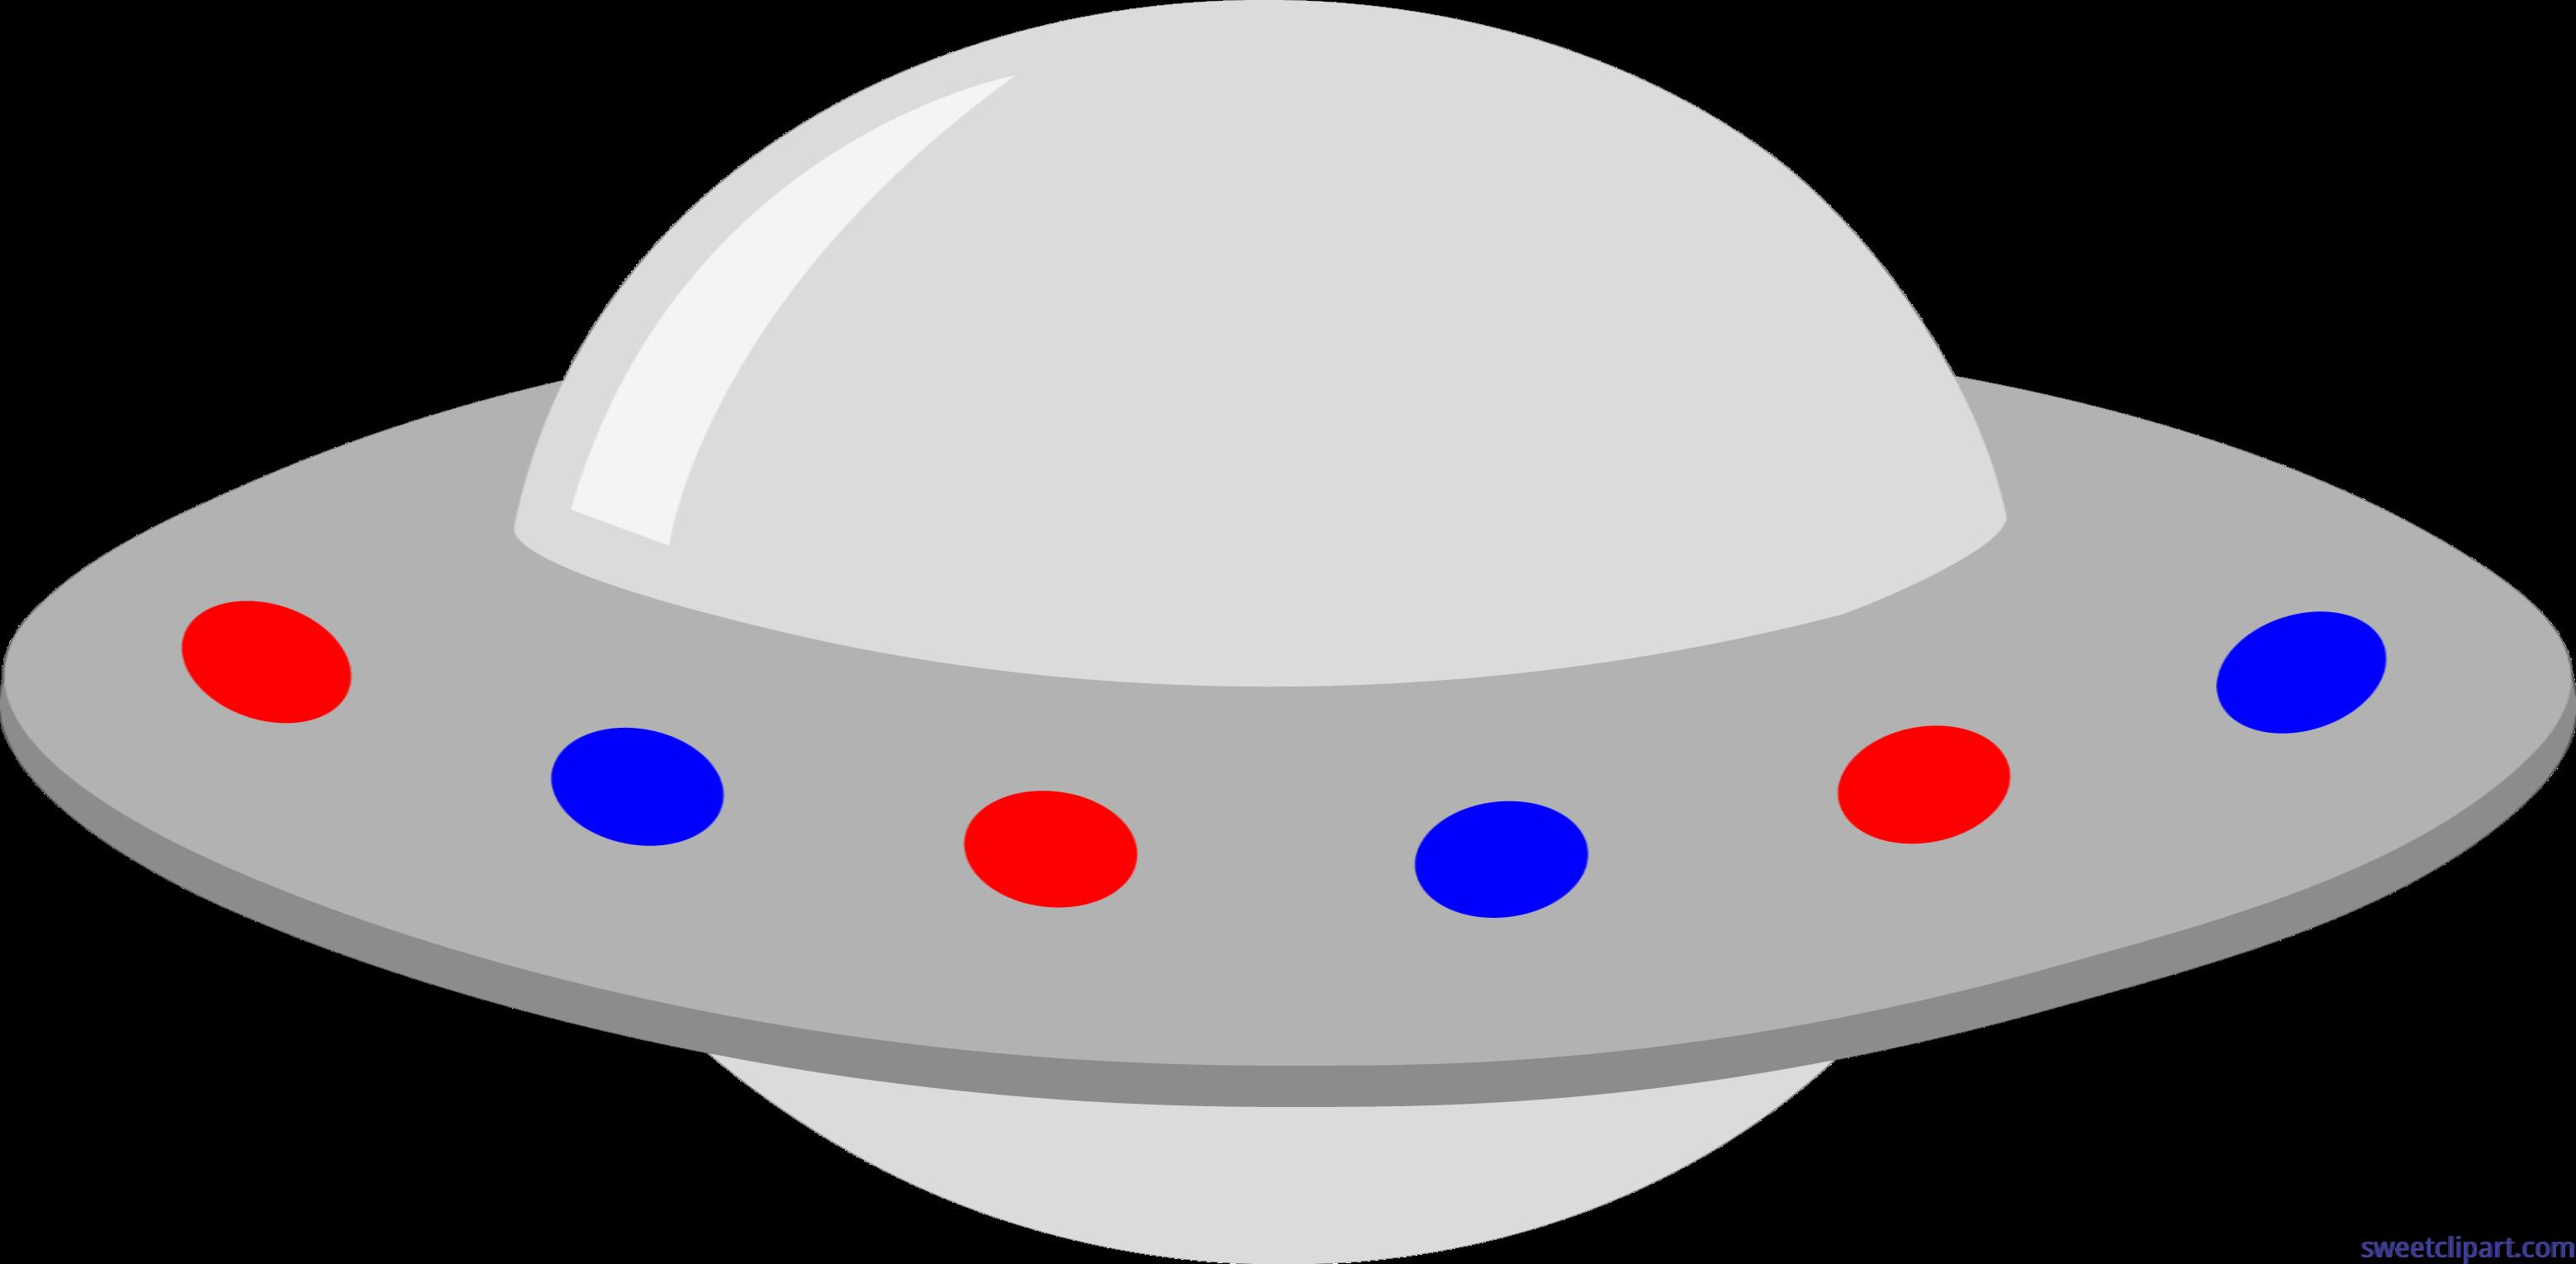 Ufo clipart line art. Gray red blue clip